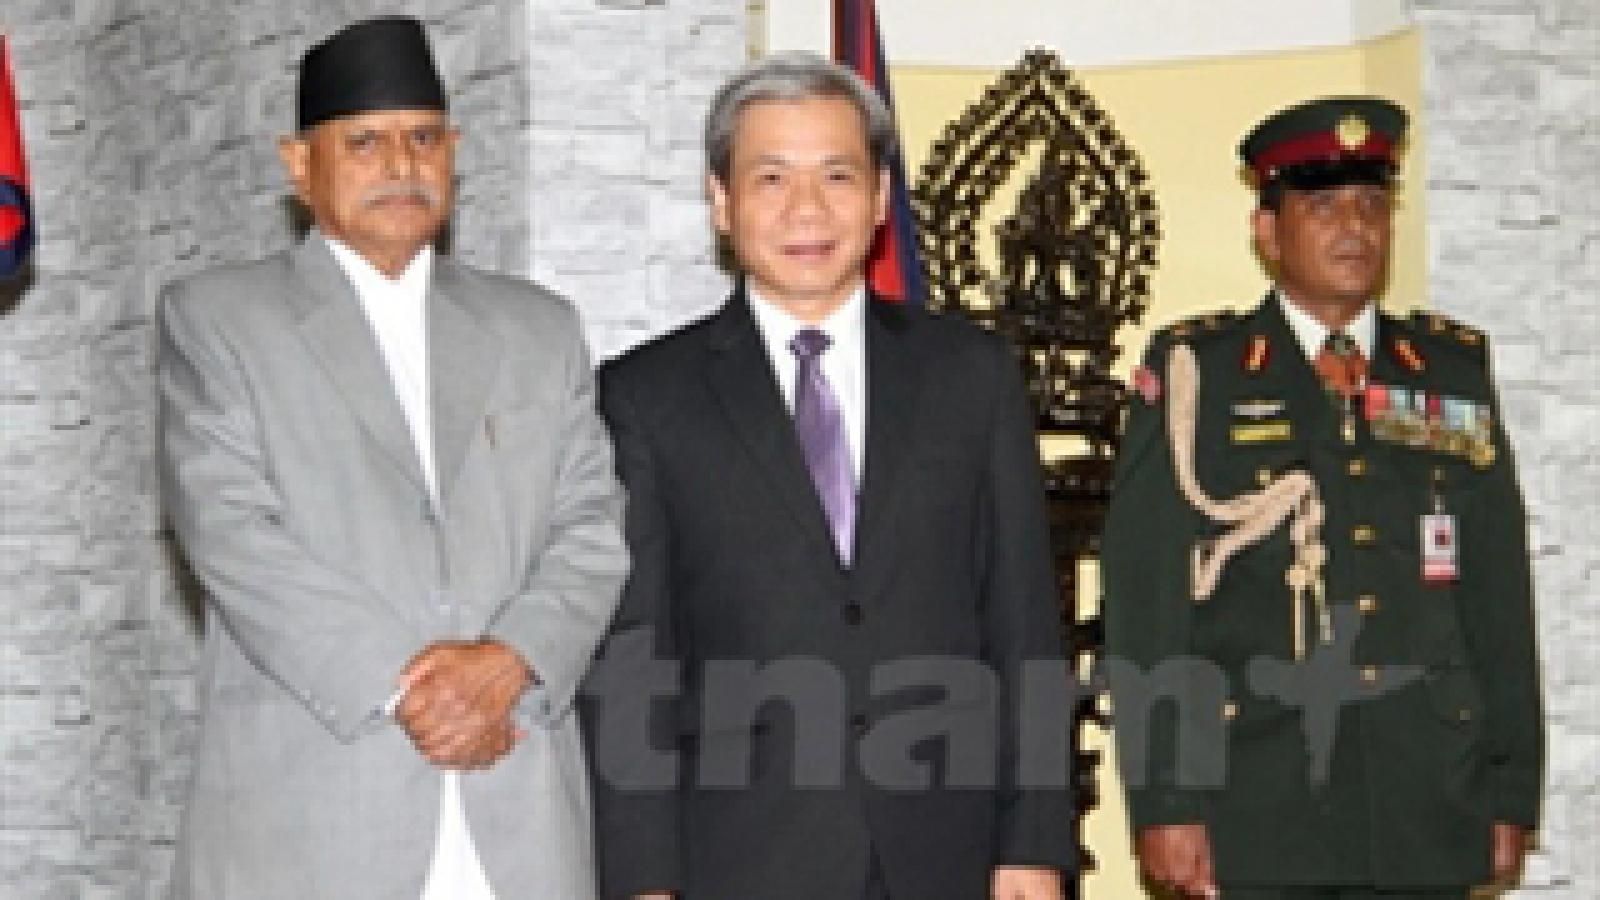 Vietnam treasures ties with Nepal